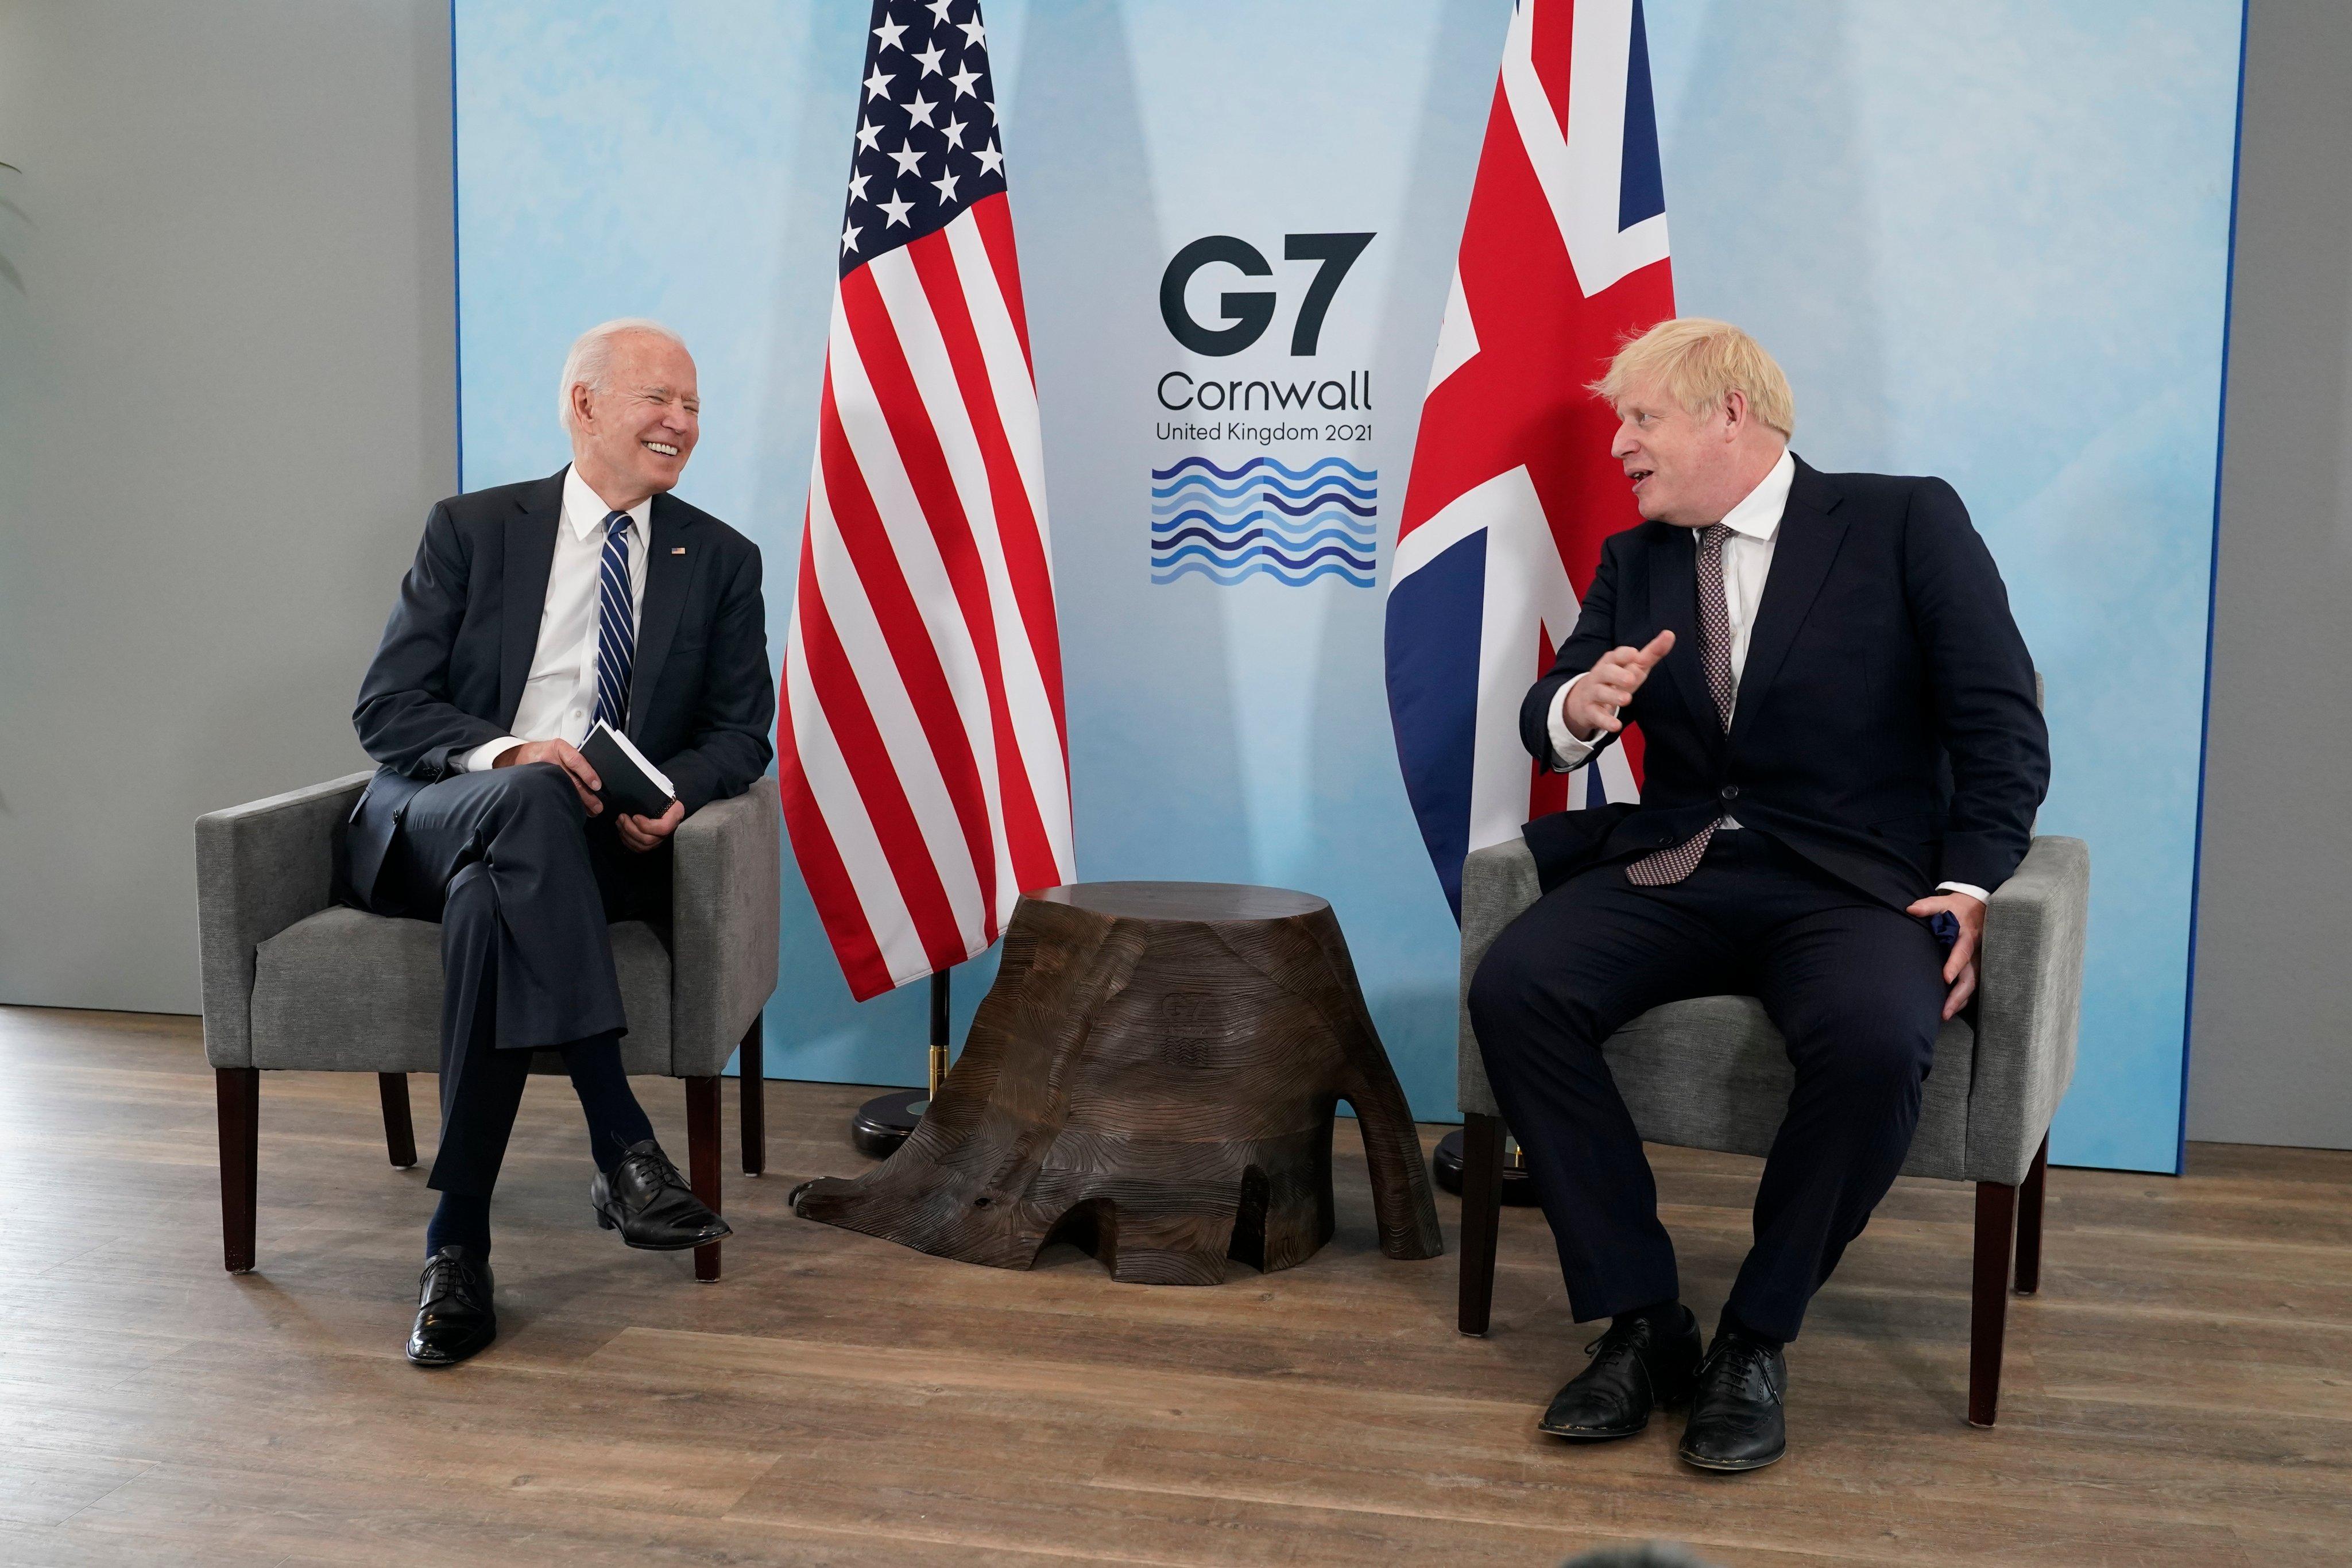 Biden, Johnson sign amended Atlantic Charter at G7 summit